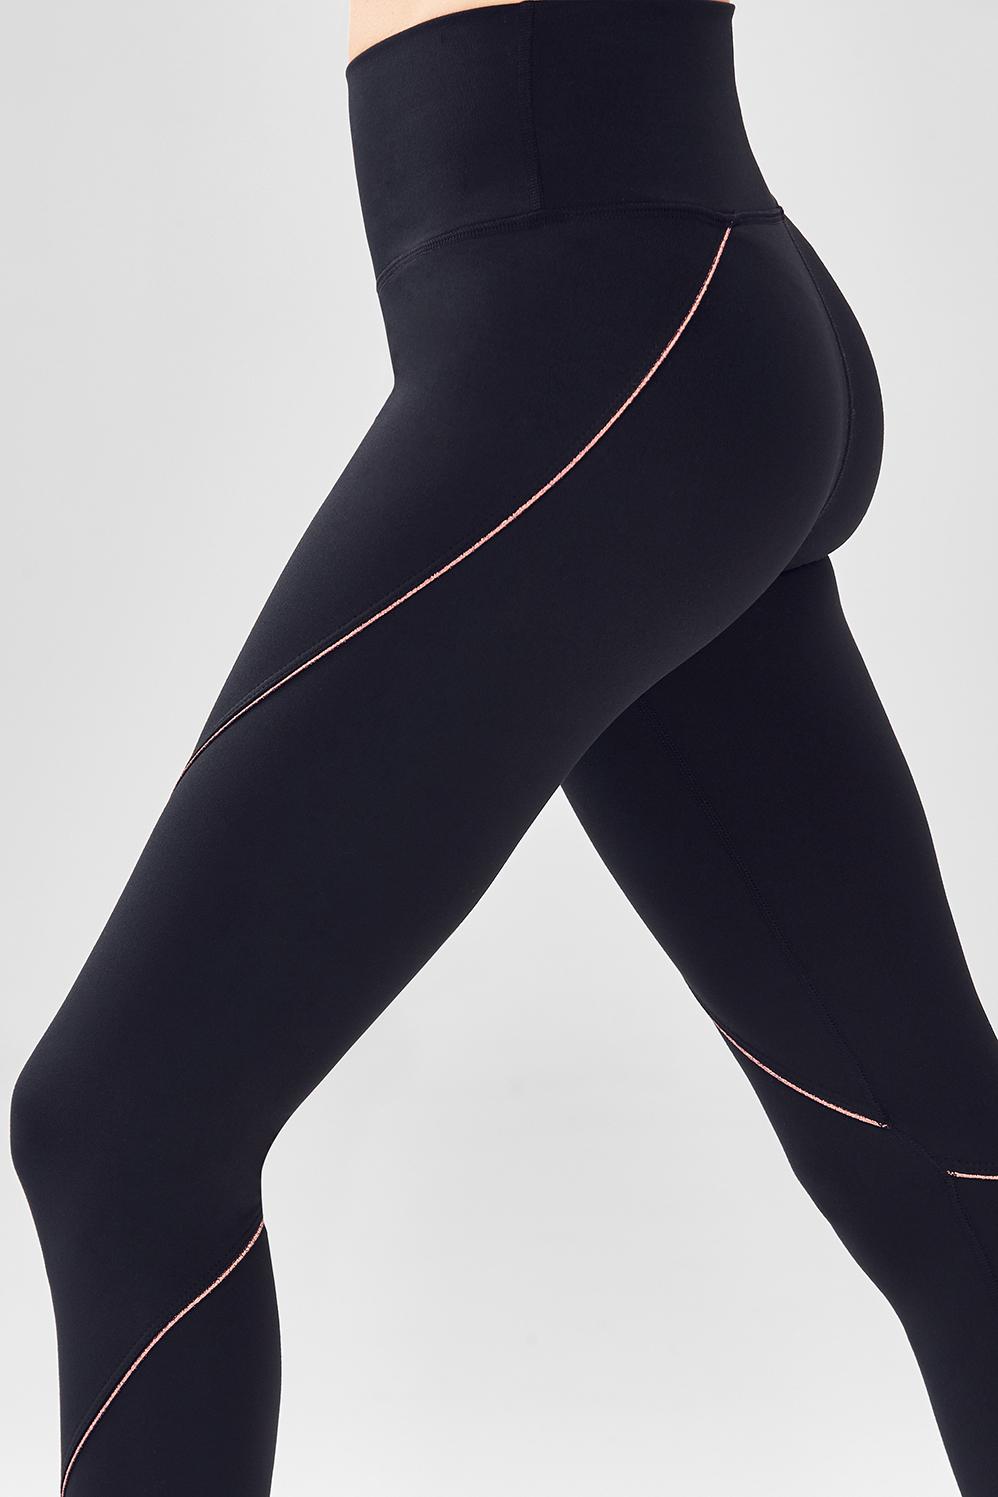 1d56dee5b2ead3 High-Waisted Statement PowerHold® Legging - Black/Pink